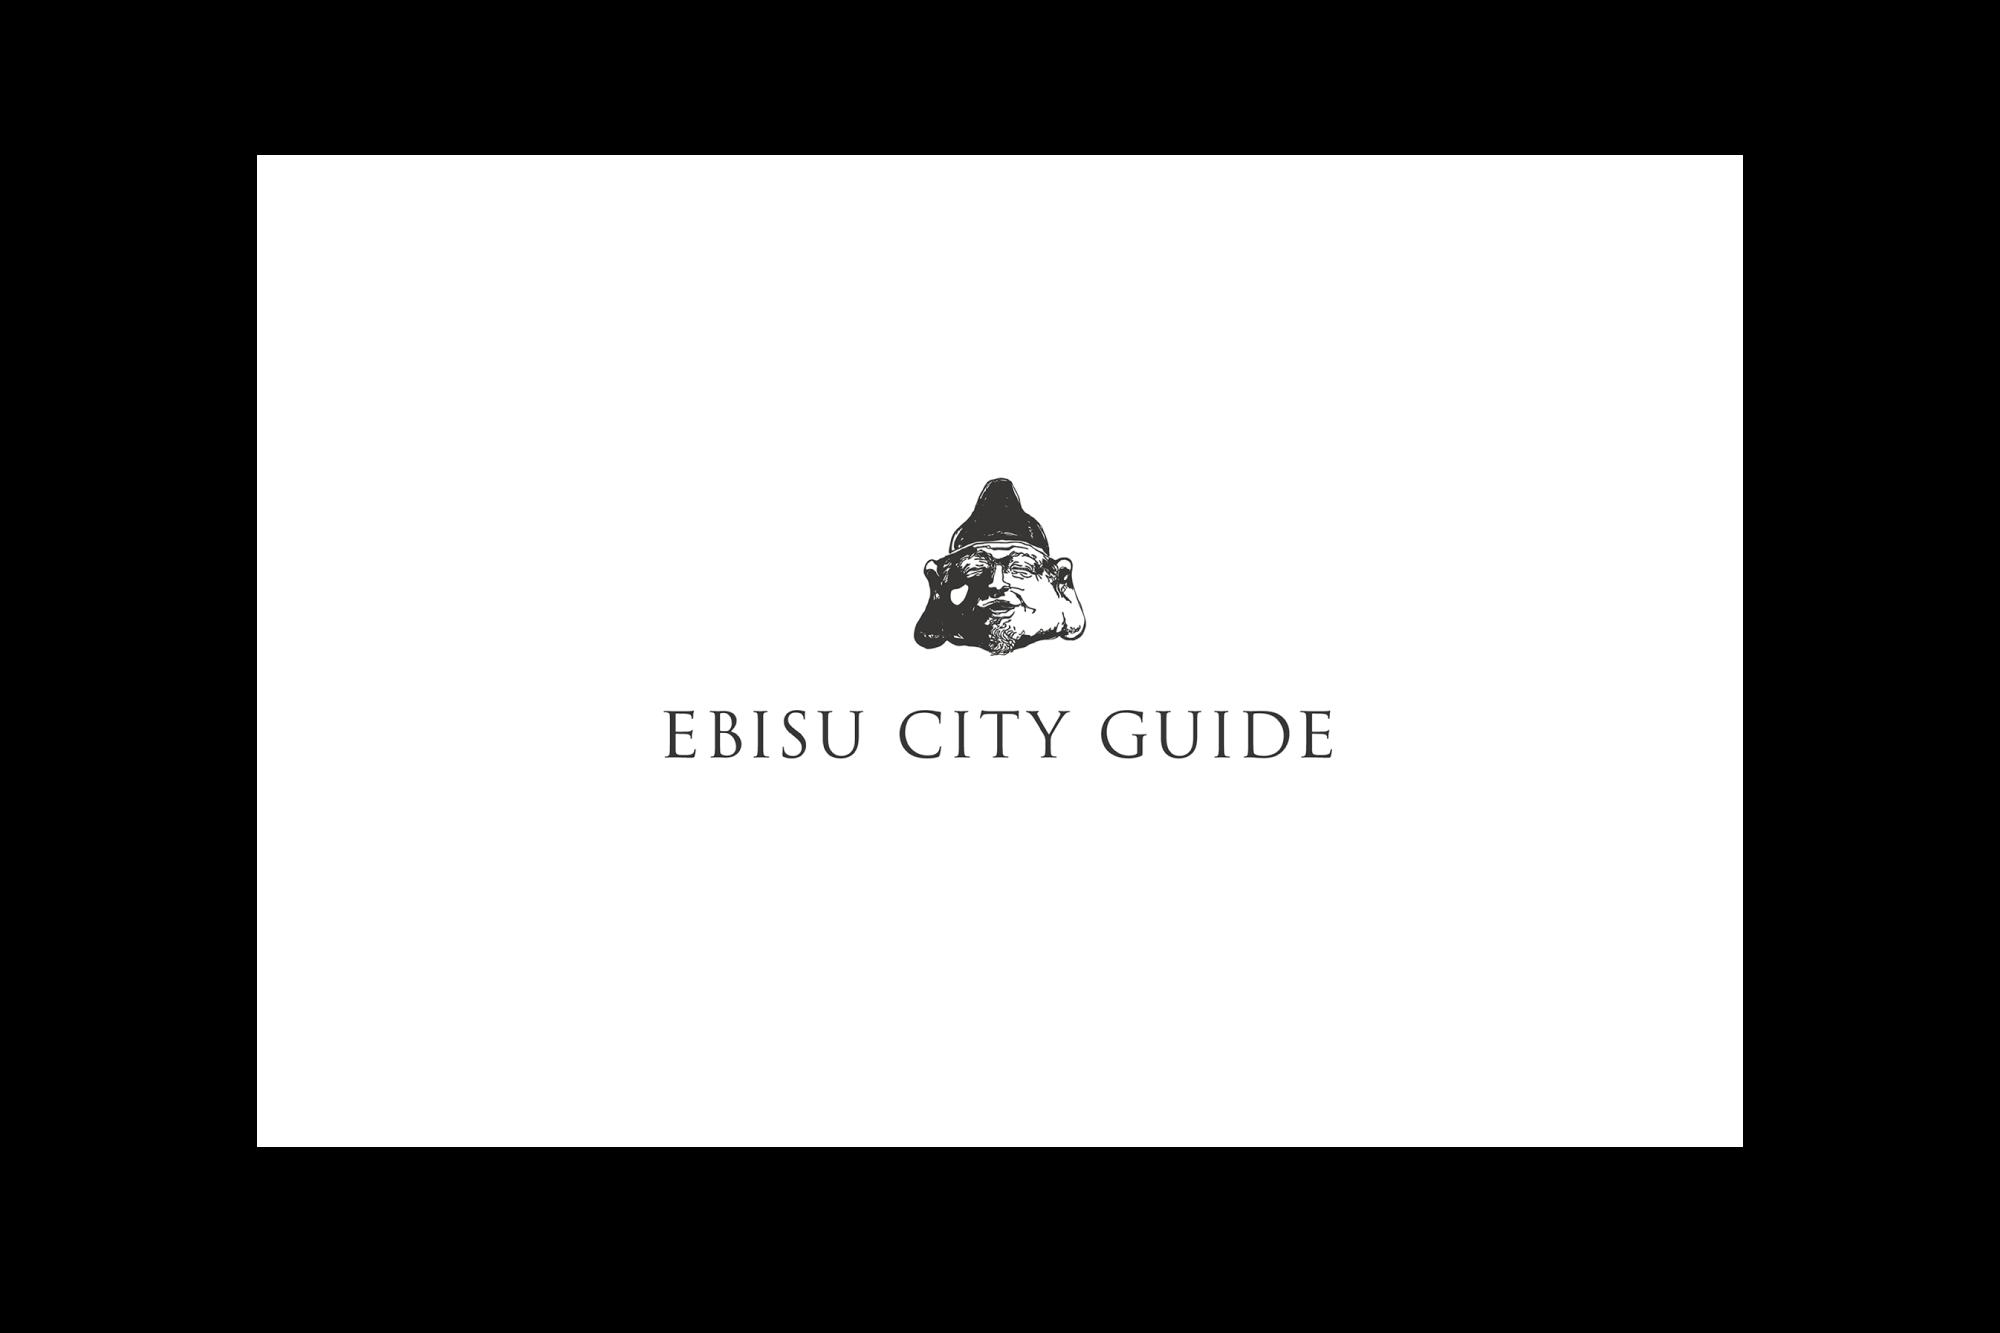 ebisucityguide